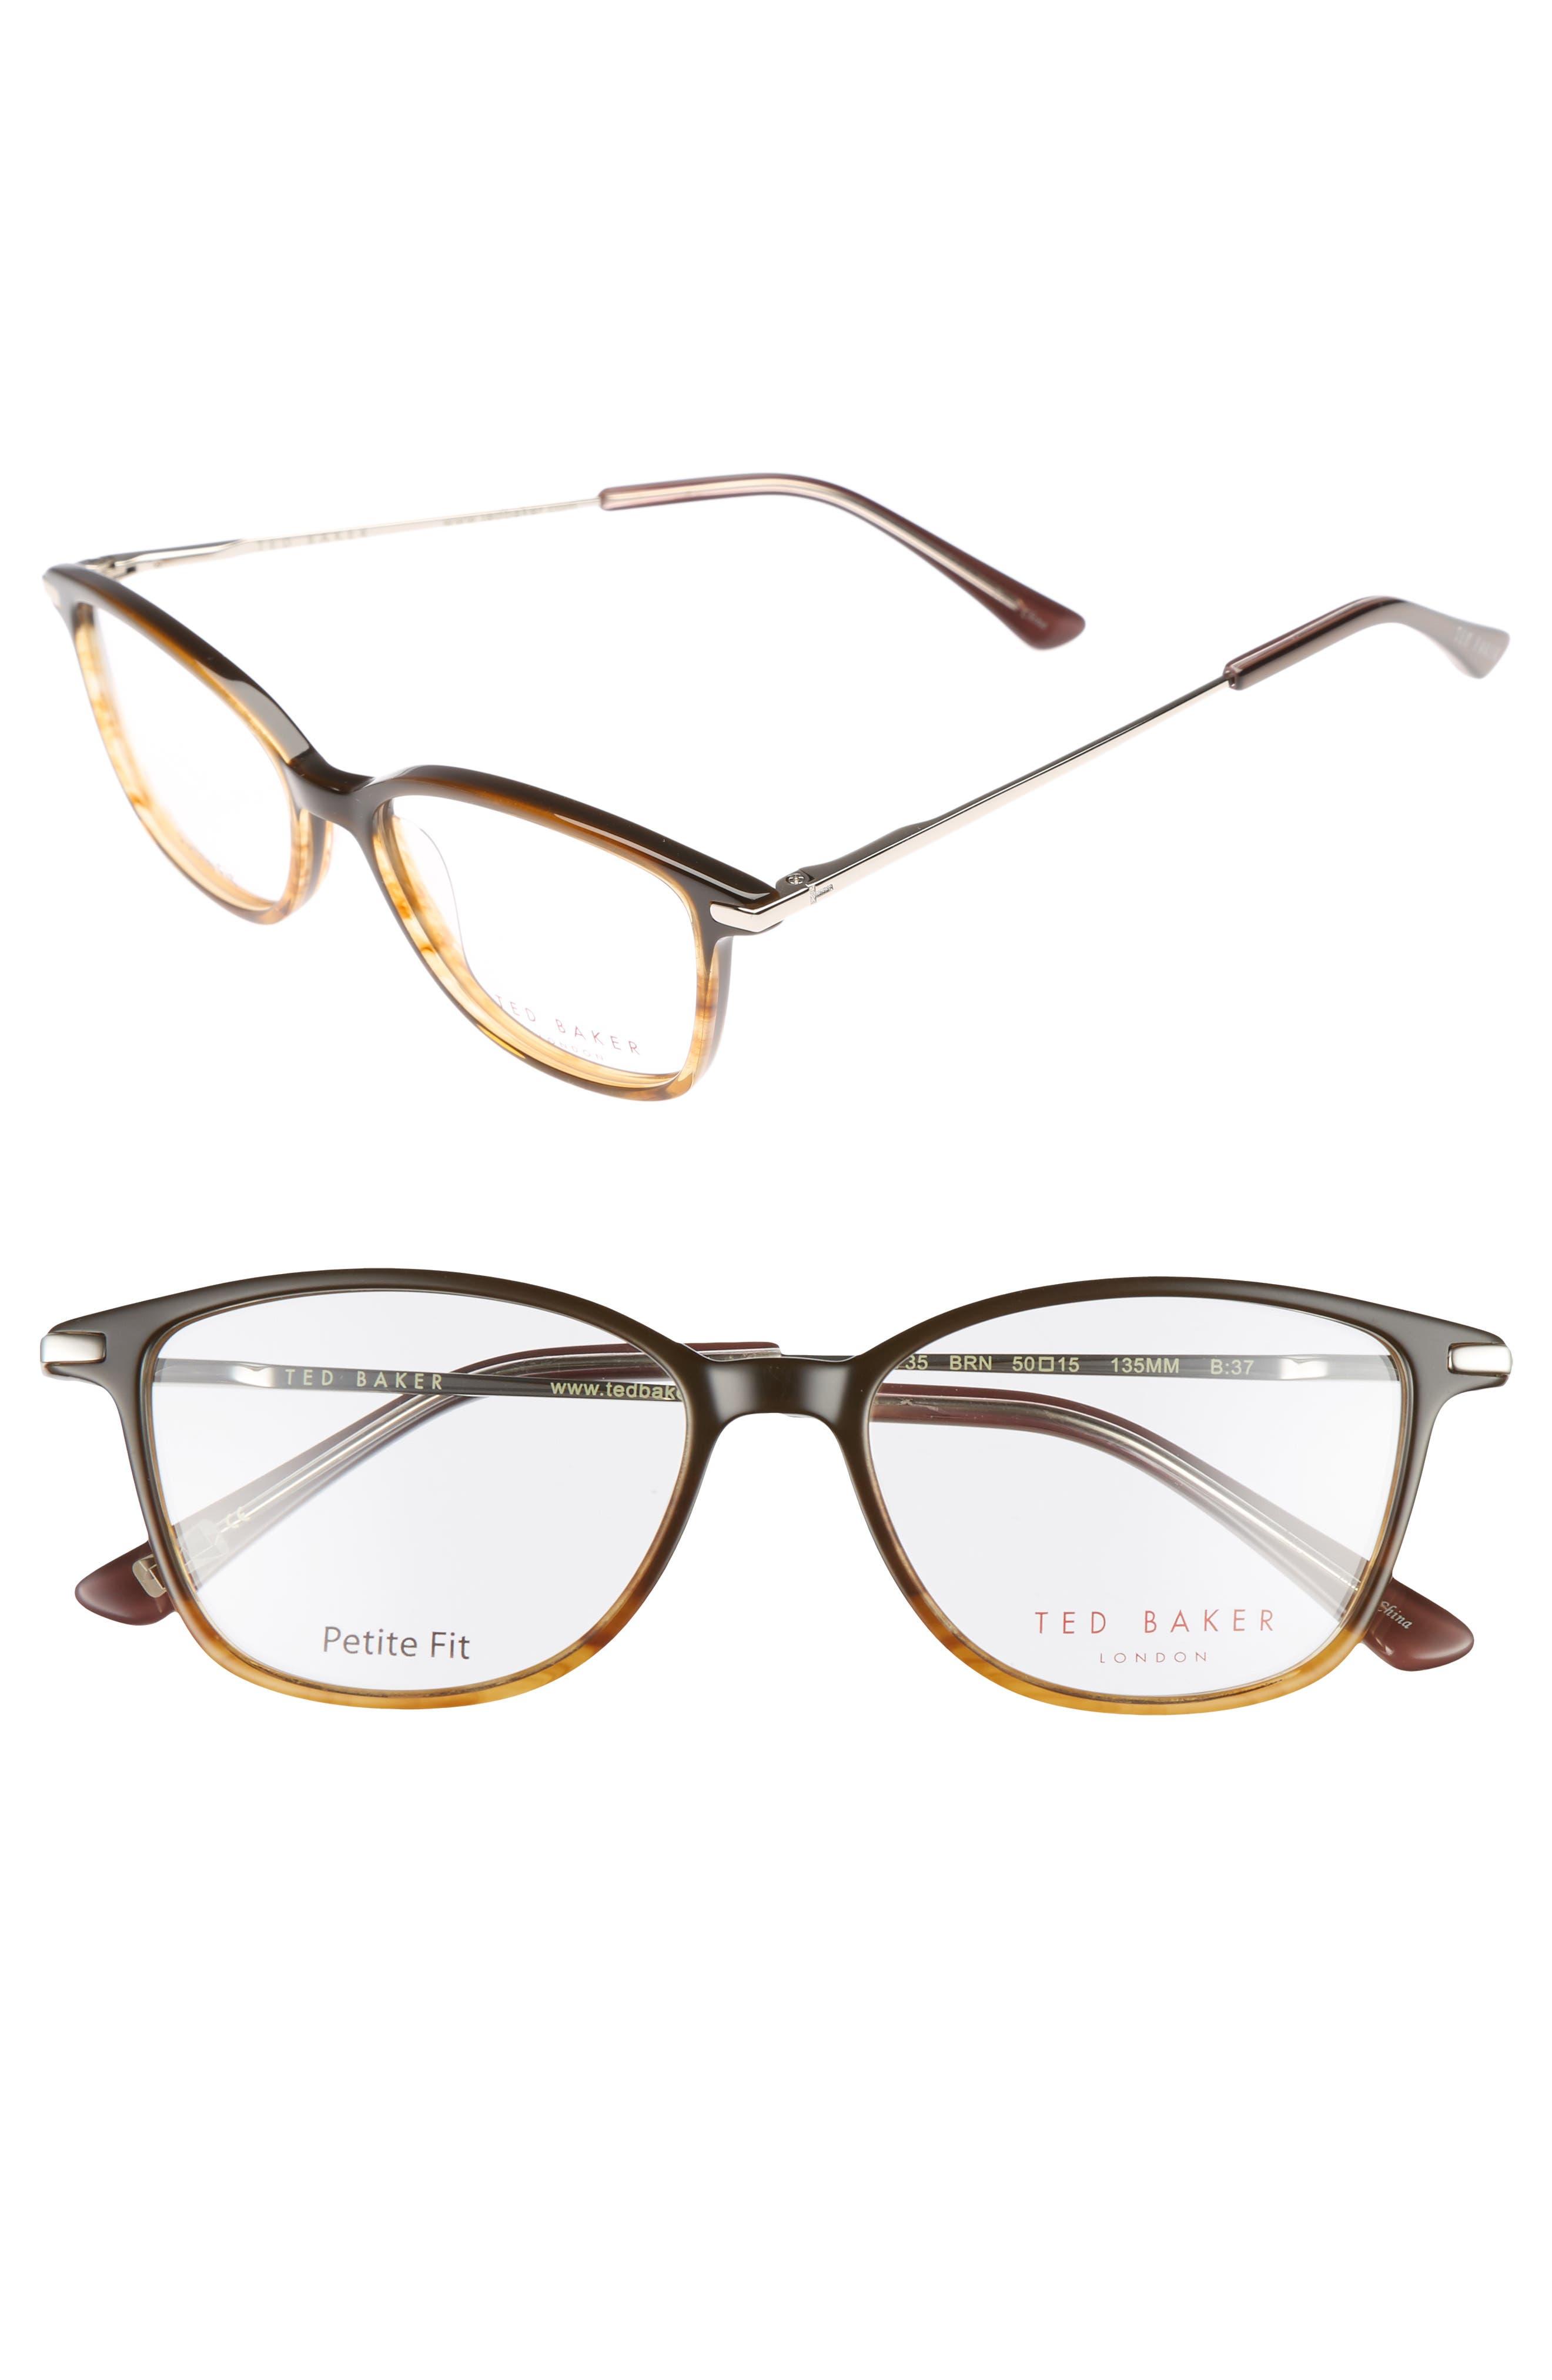 Alternate Image 1 Selected - Ted Baker London Petite Fit 50mm Optical Glasses